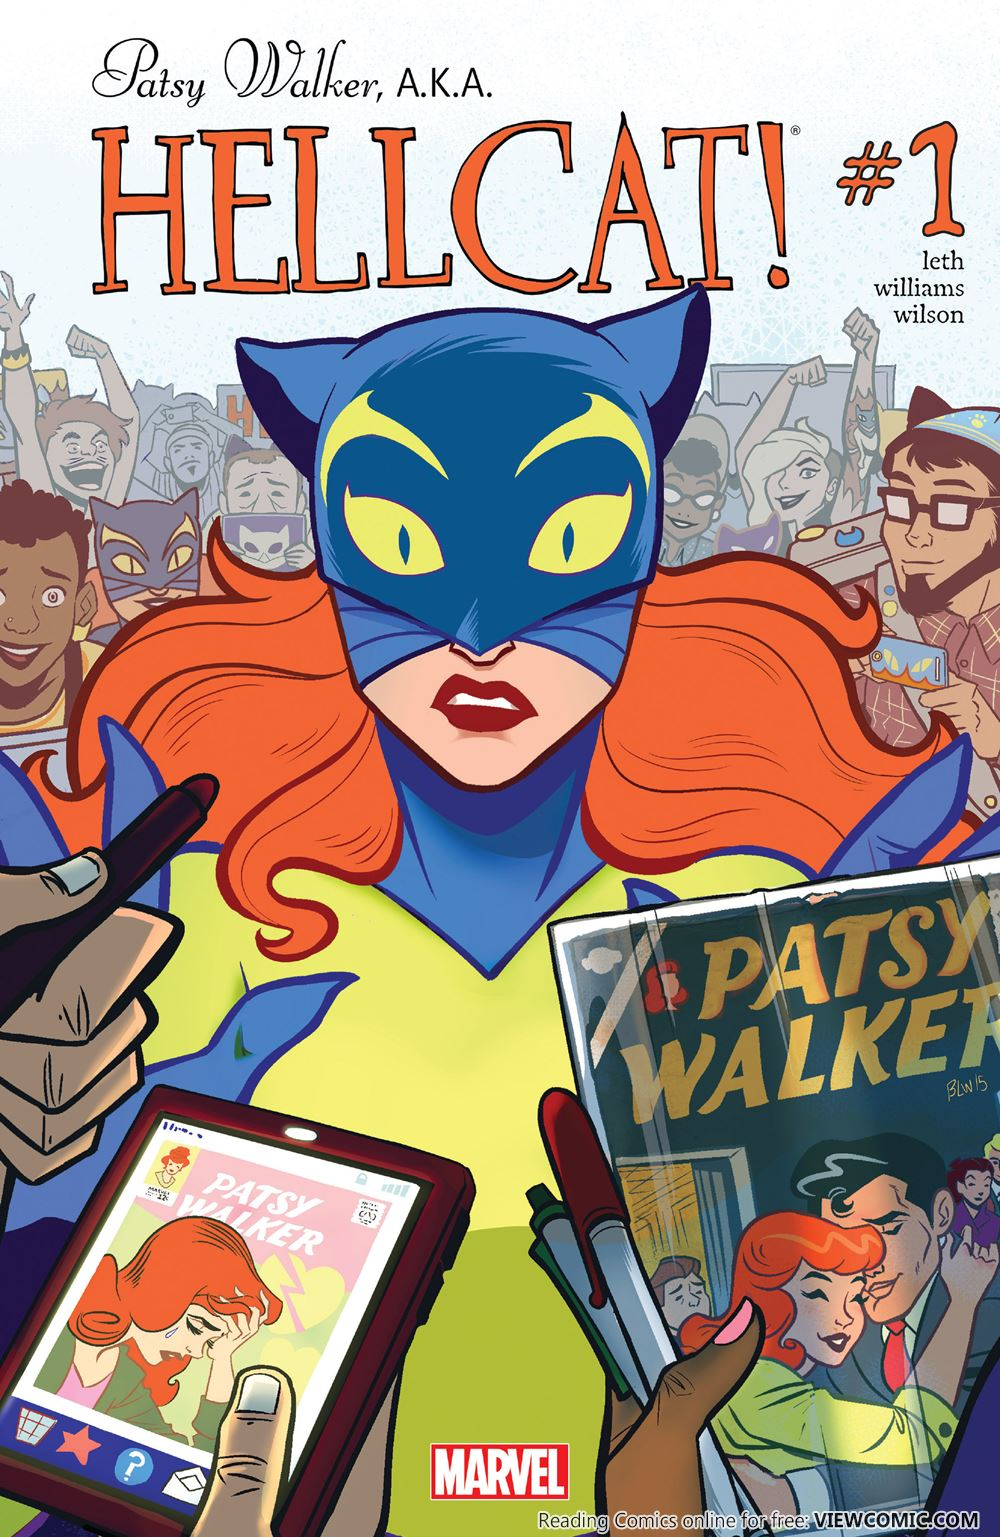 Patsy Walker, A.K.A. Hellcat